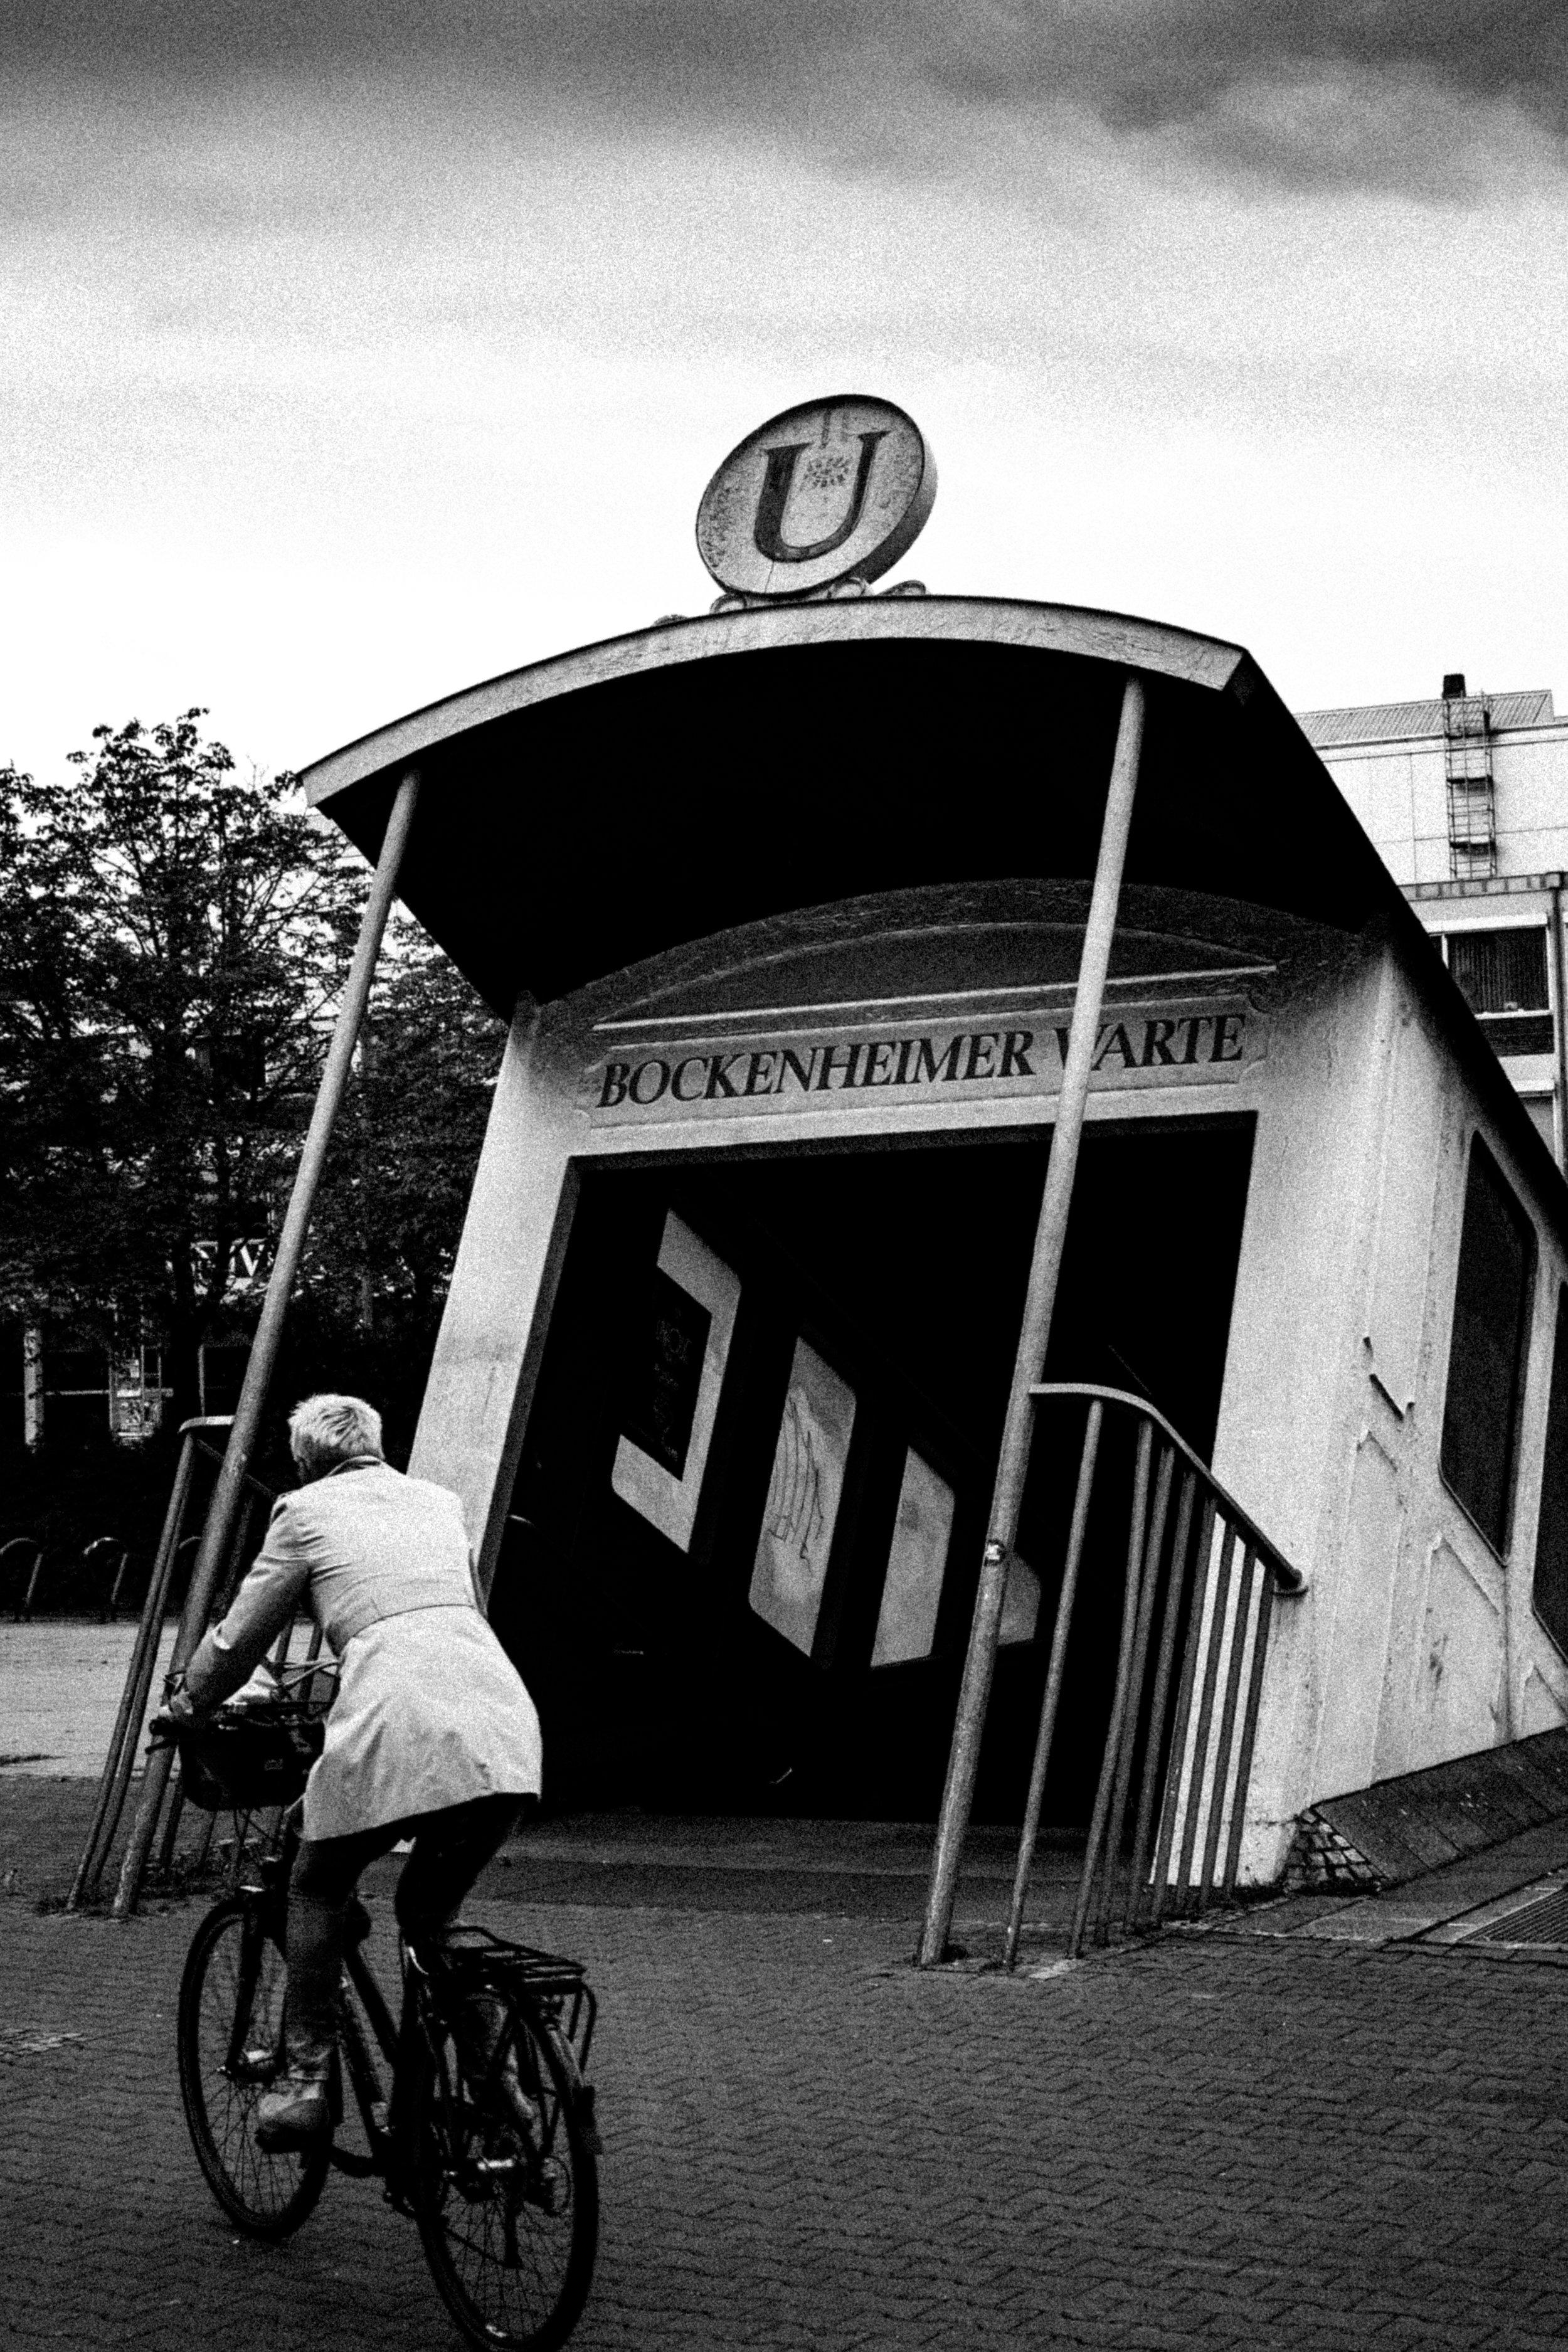 BOCKENHEIMER WARTE STATION, FRANKFURT